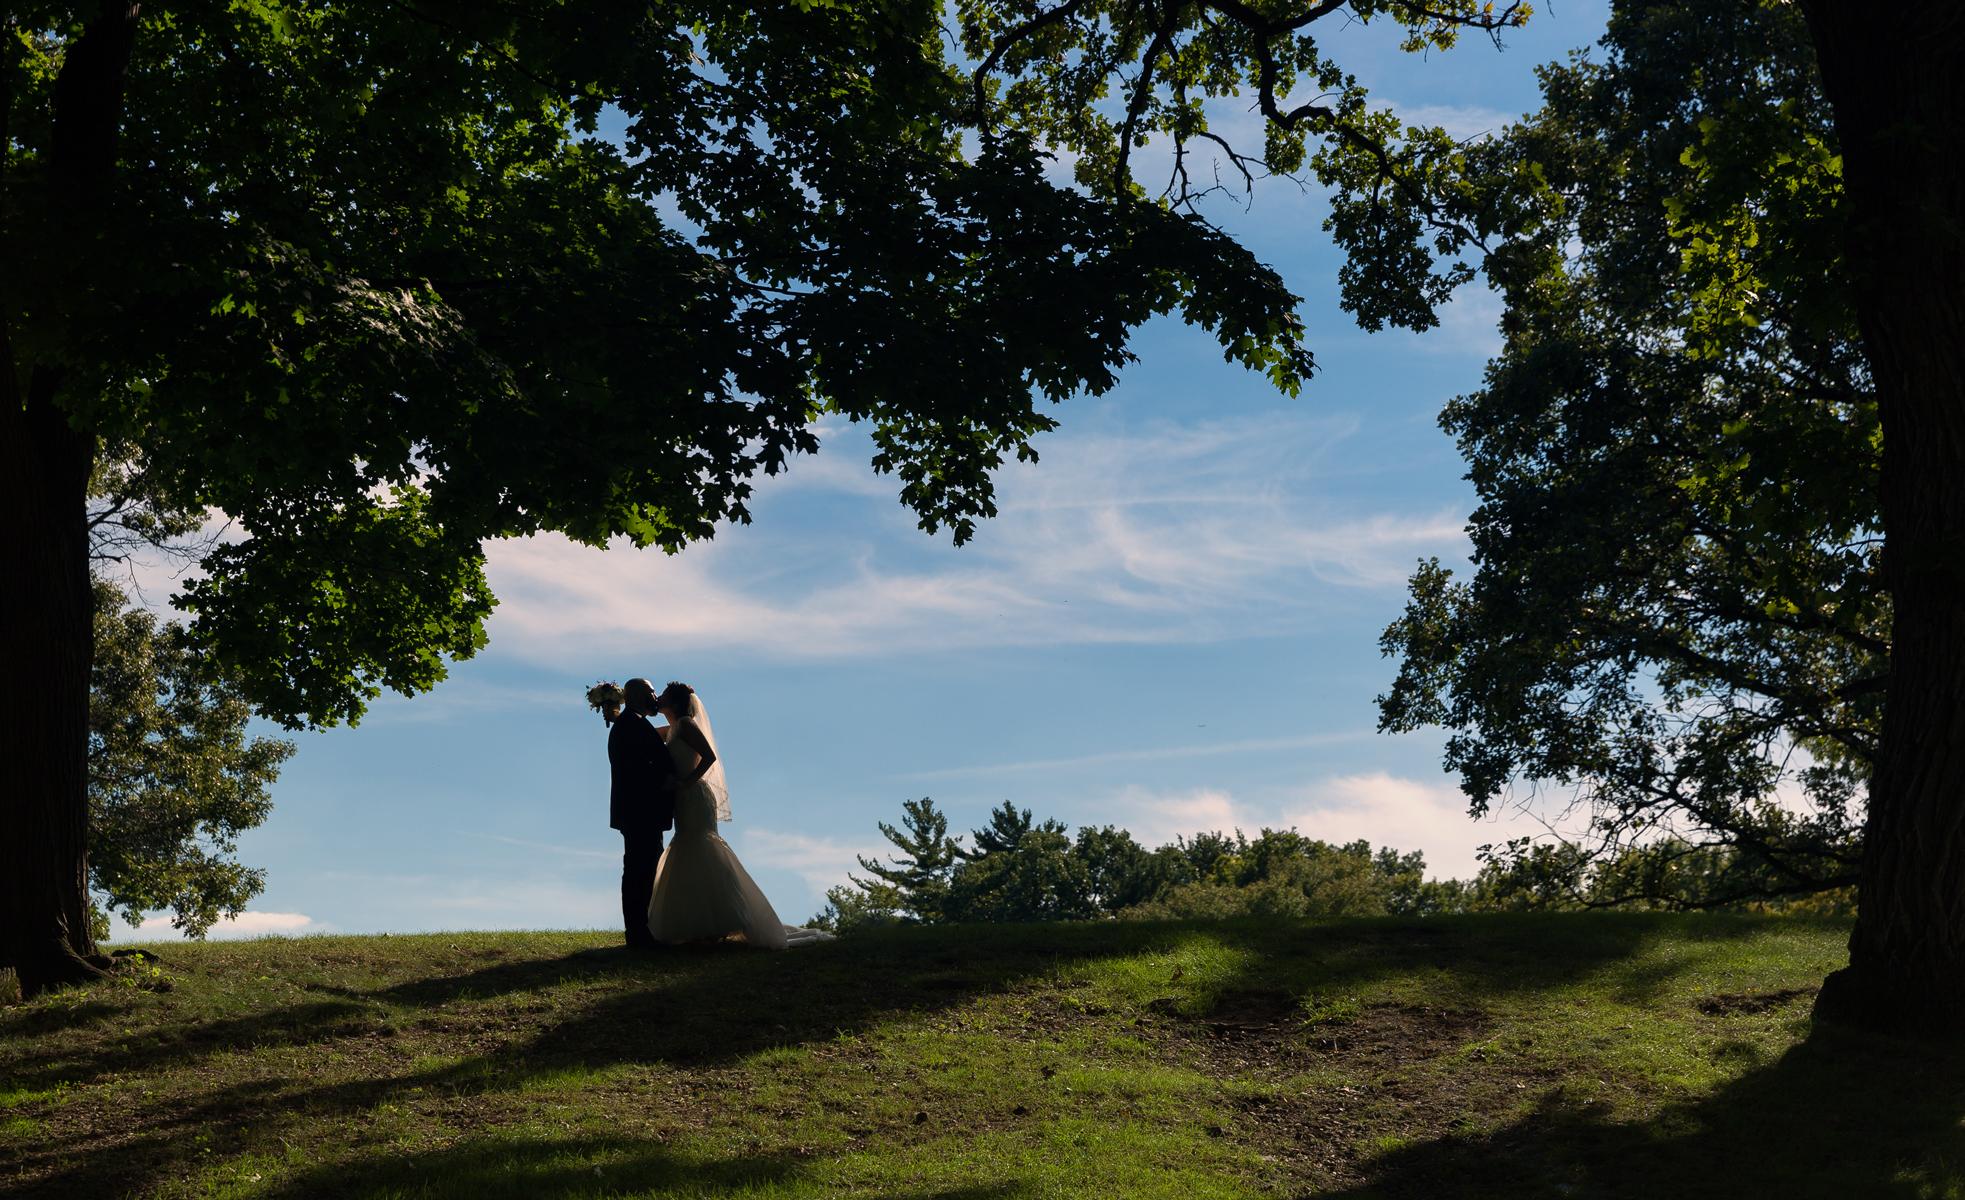 Twinbliss_Photography_Chicago_Weddings_Engagements_Elgin_Illinois